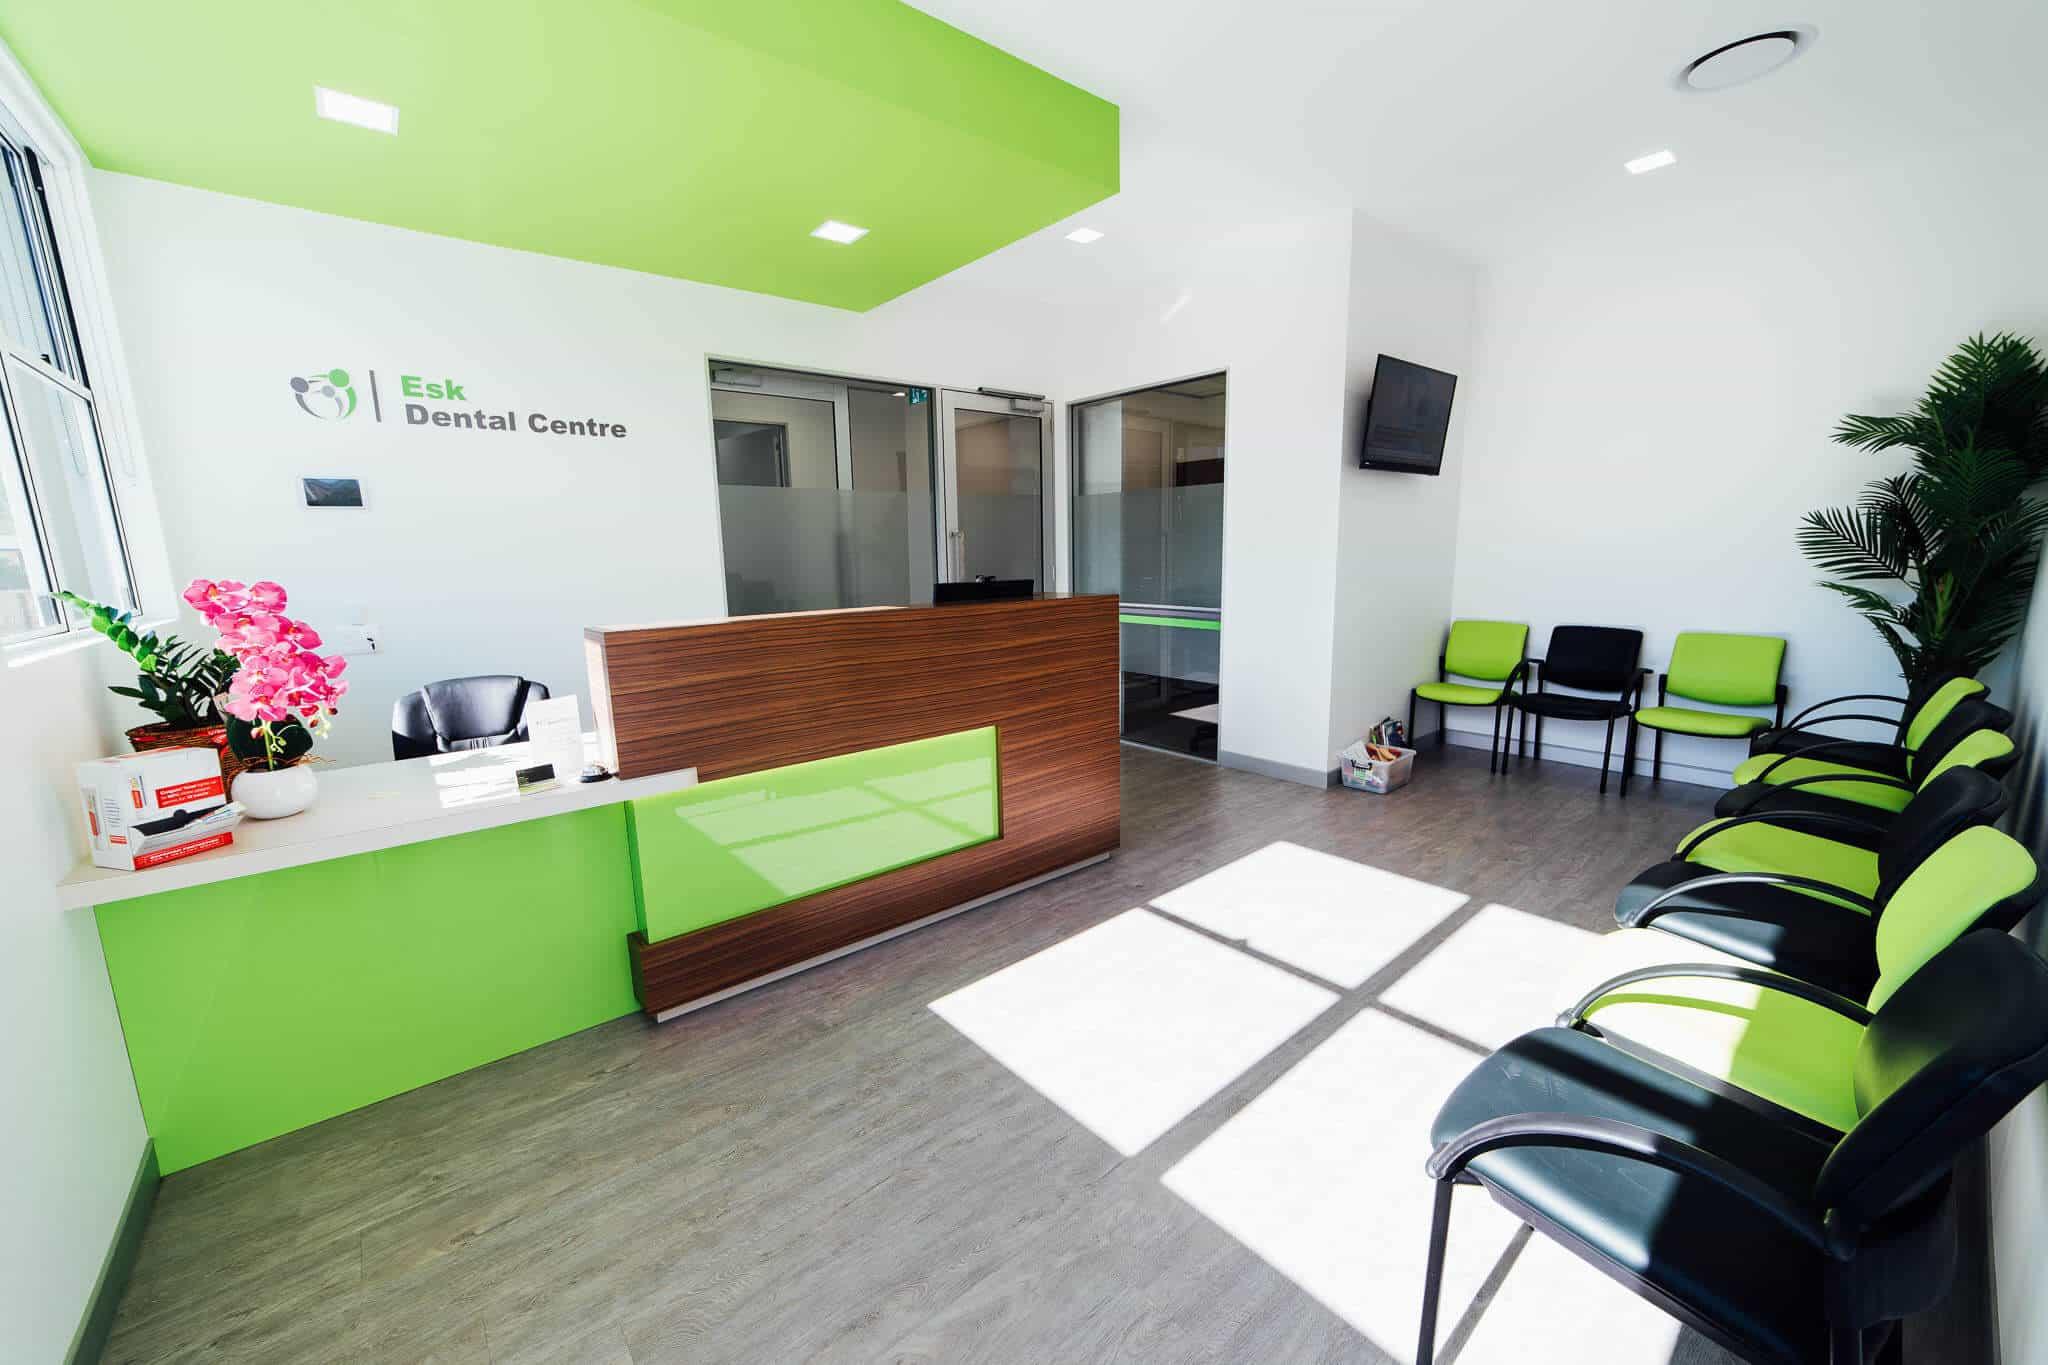 Esk Dental fitout - reception